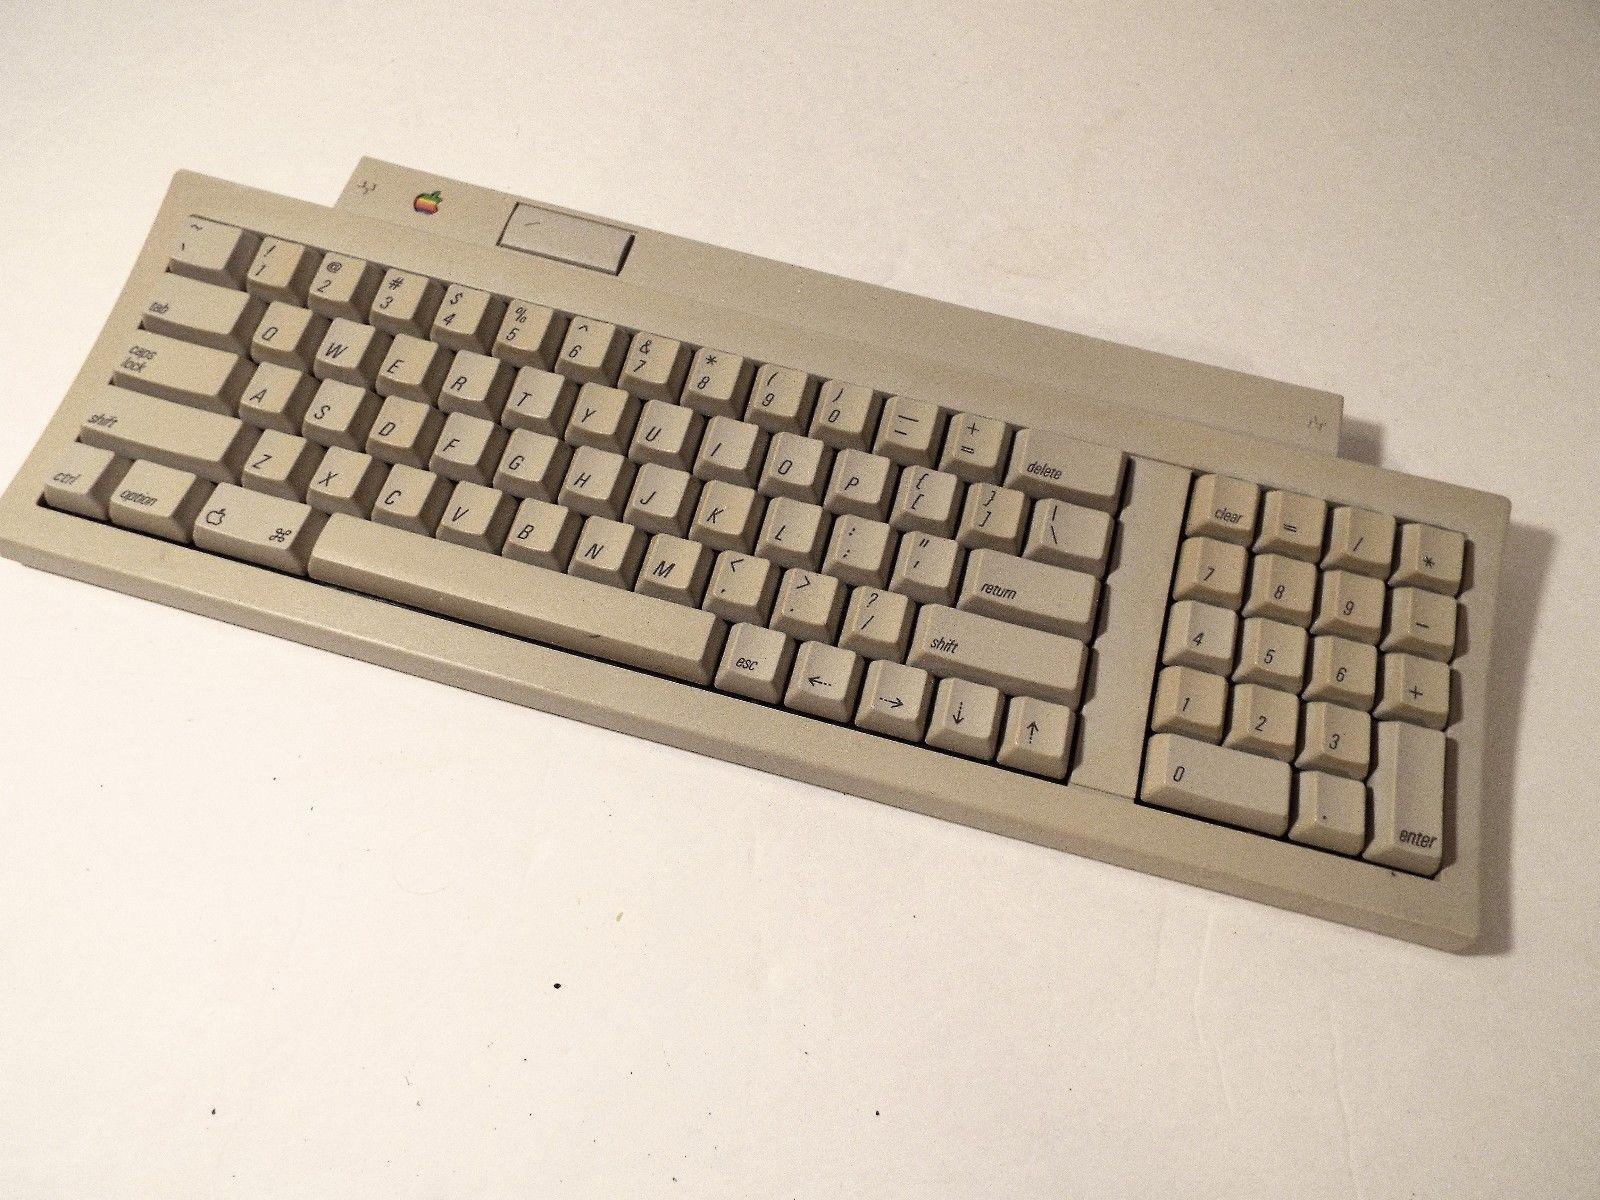 Apple Keyboard Ii Apple Keyboard Vintage Apple Apple